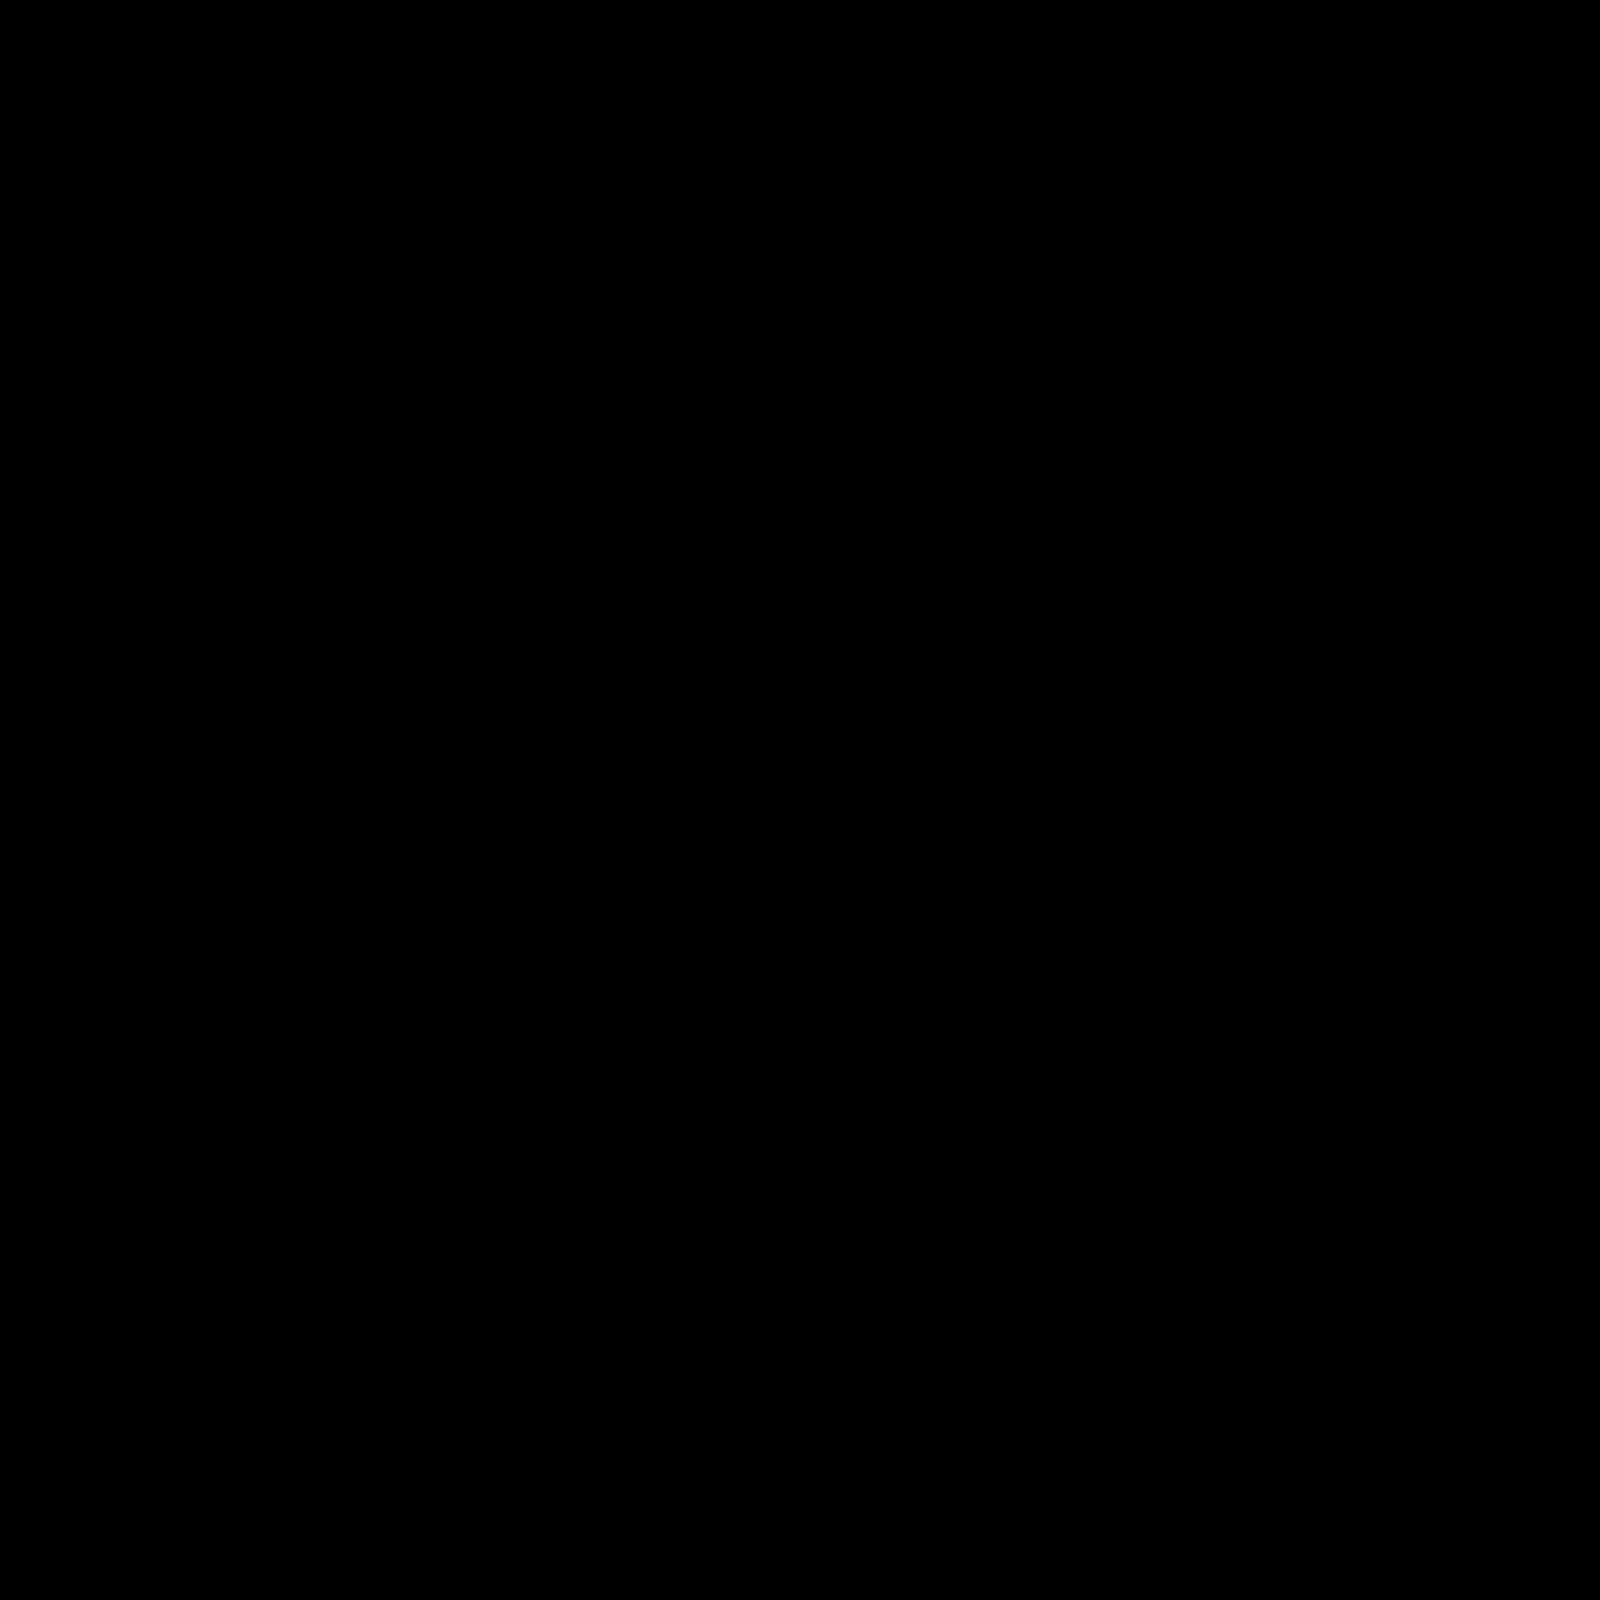 Black Shape Paper Plane PNG Image